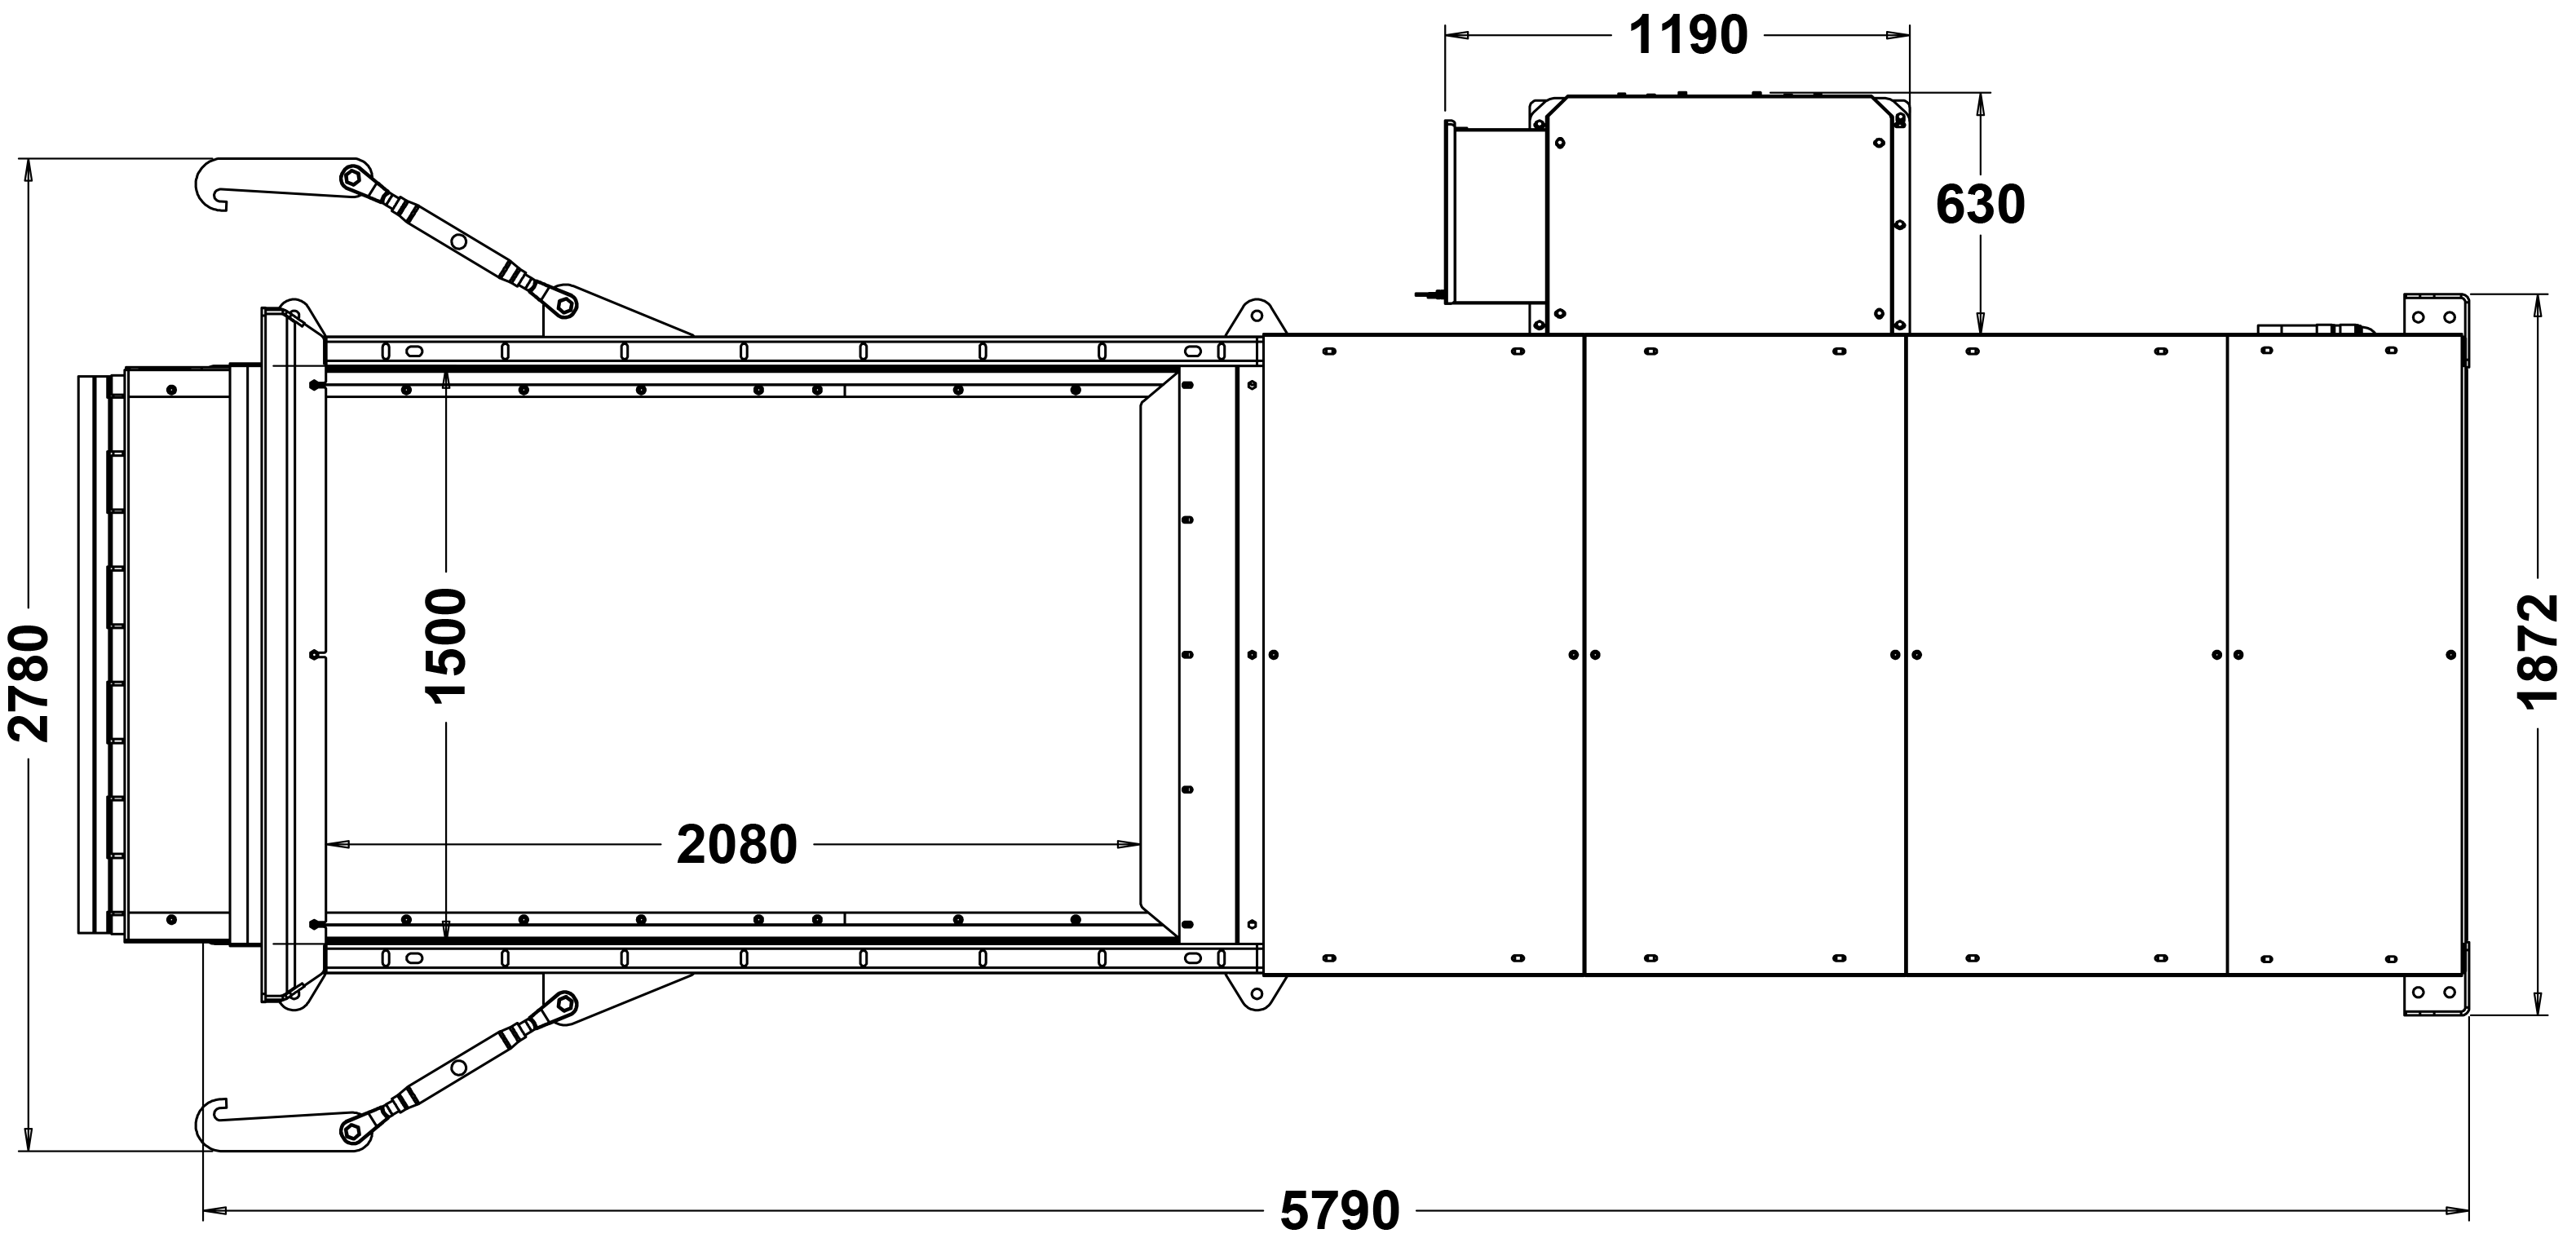 G140 LAYOUT 03